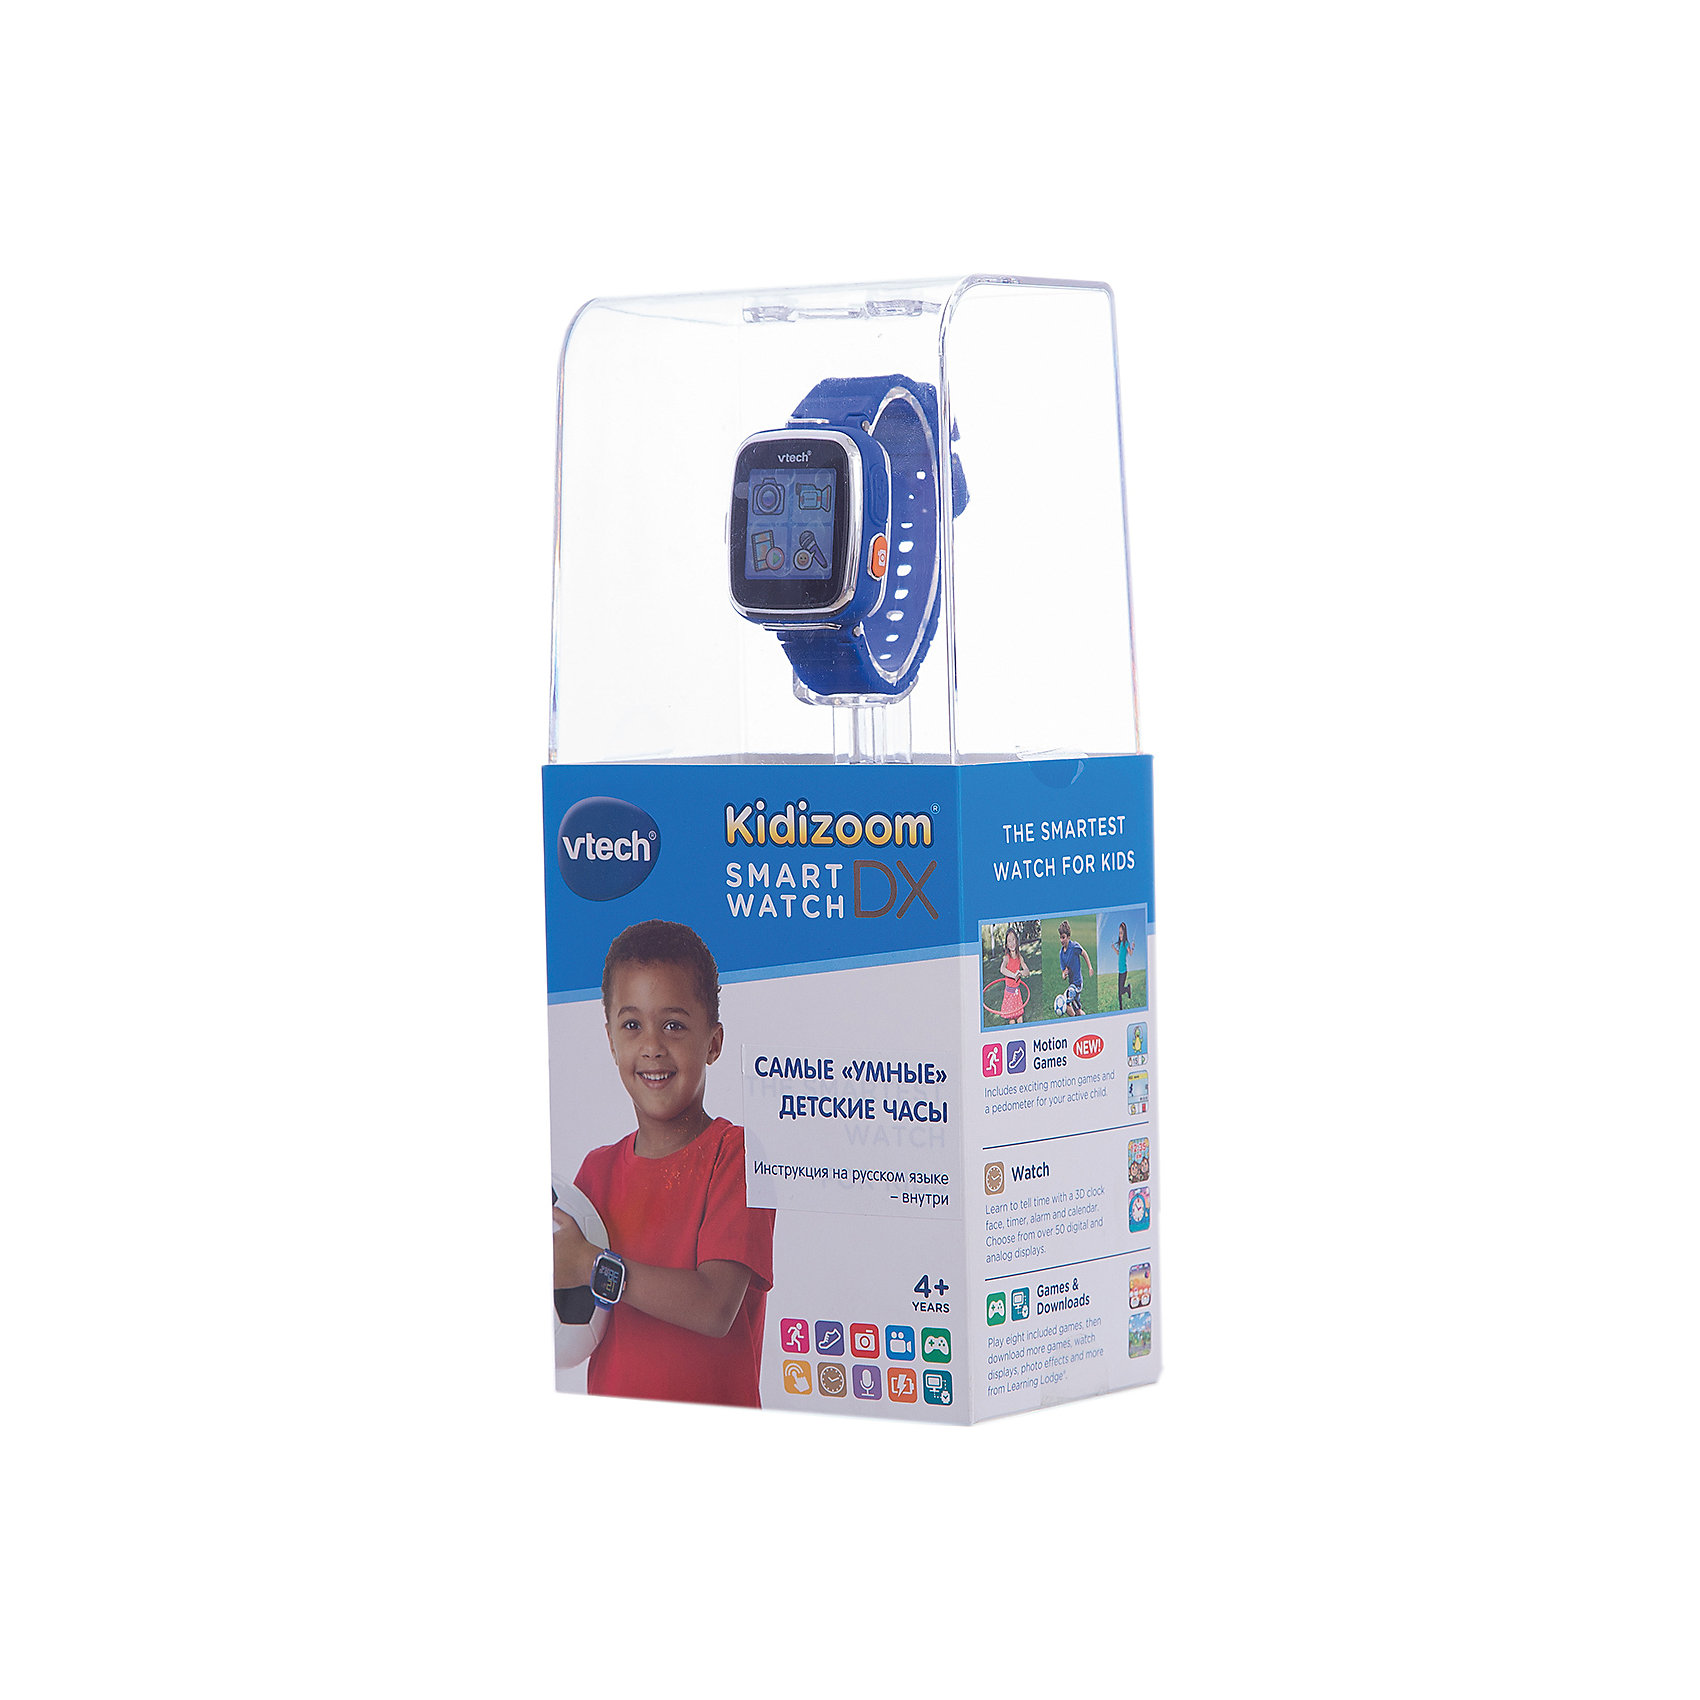 Цифровые часы для детей Kidizoom Smartwatch DX, синие, Vtech<br><br>Ширина мм: 127<br>Глубина мм: 279<br>Высота мм: 88<br>Вес г: 576<br>Возраст от месяцев: 48<br>Возраст до месяцев: 108<br>Пол: Унисекс<br>Возраст: Детский<br>SKU: 5471076